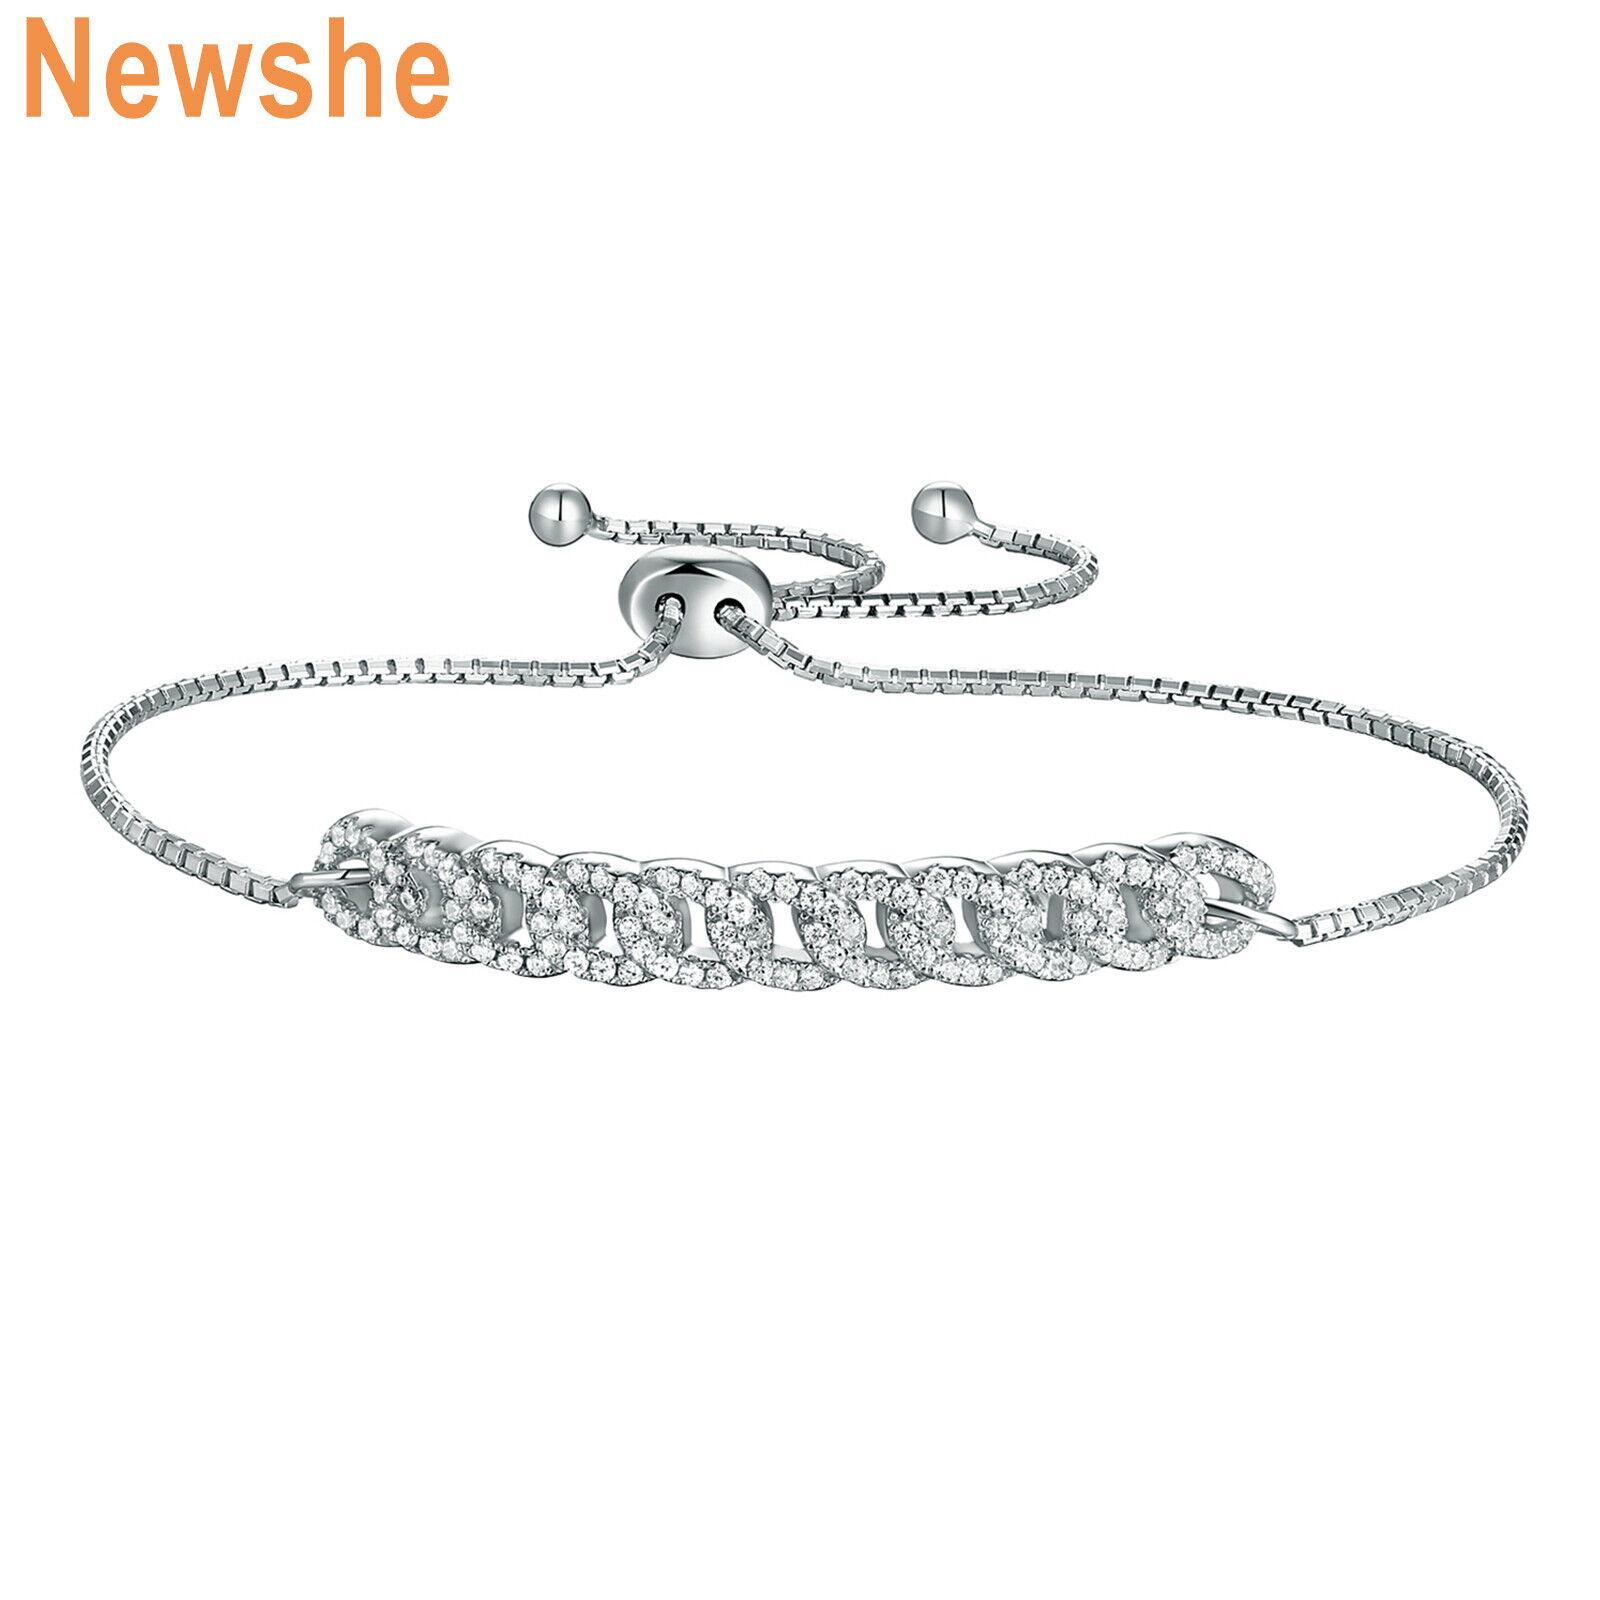 Newshe Adjustable Chain Bracelet For Women 925 Sterling Silver Round White Cz